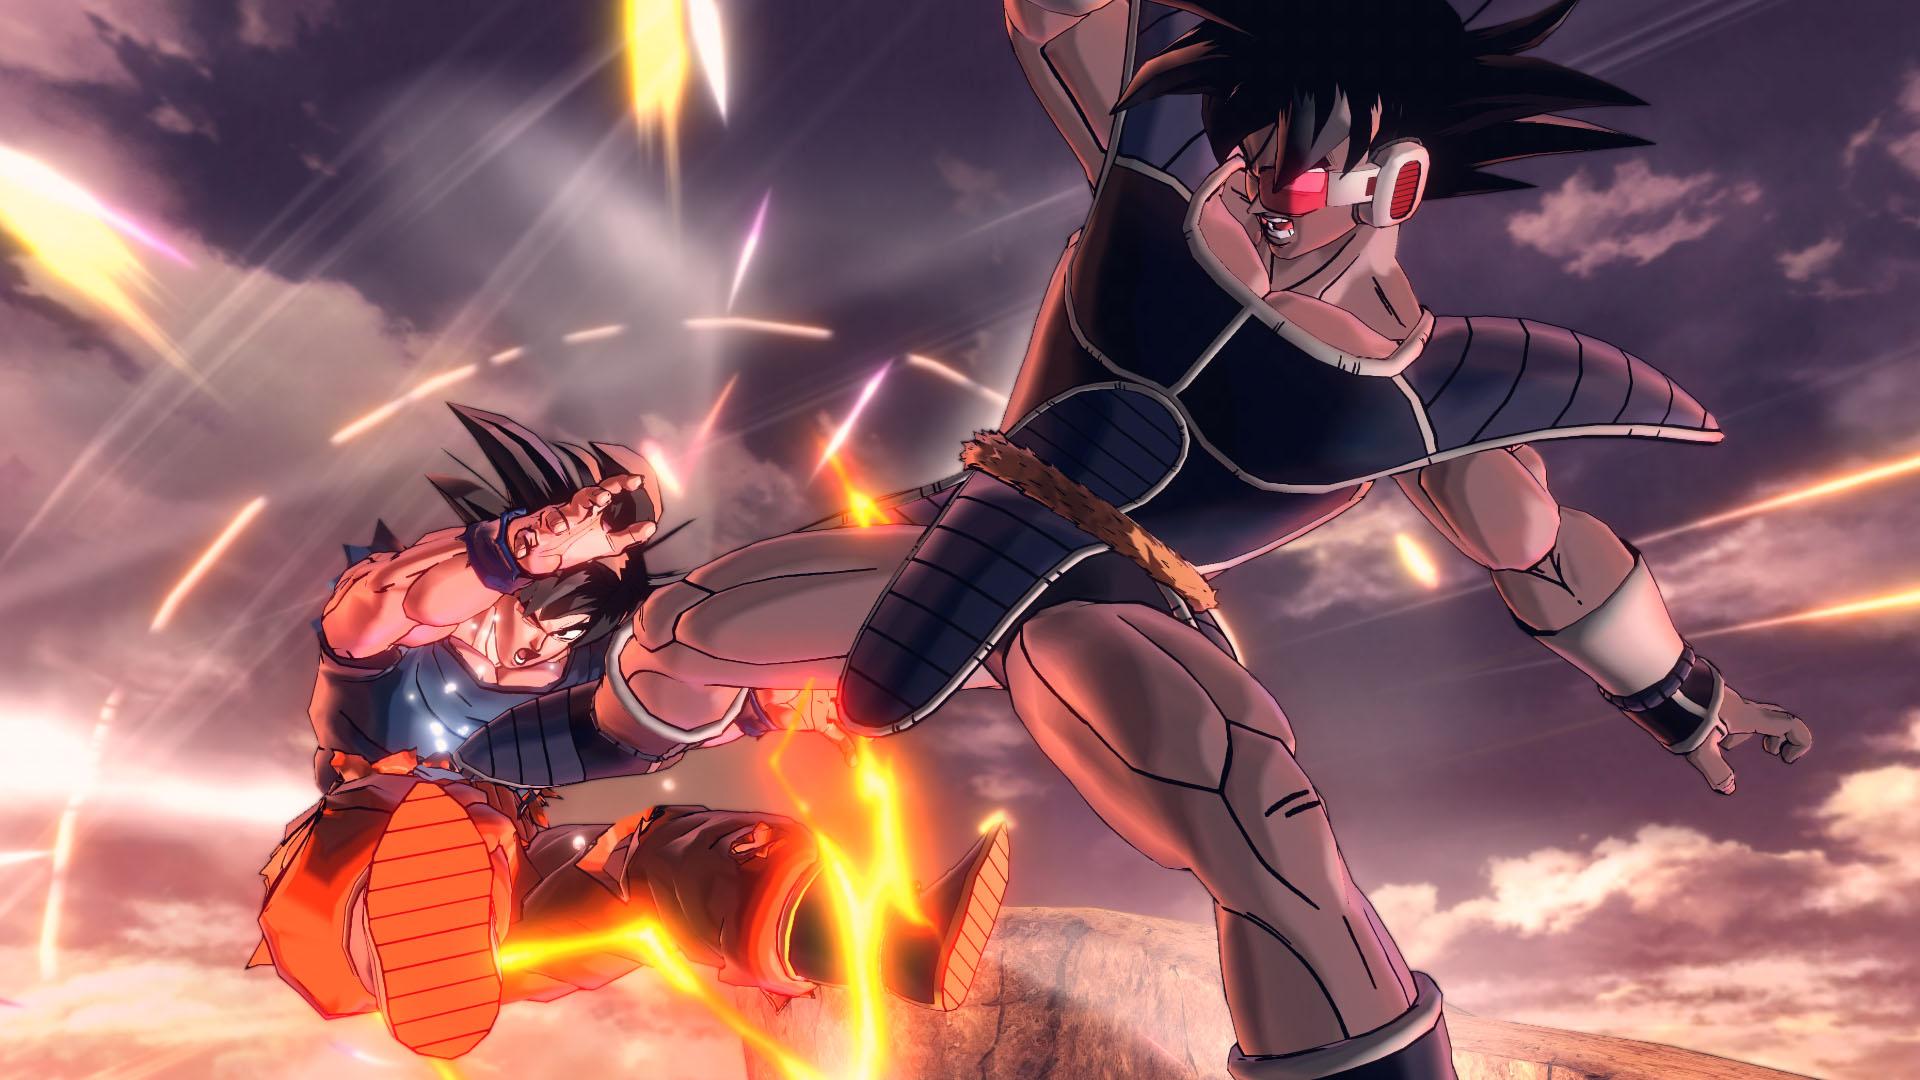 Versão gratuita para Dragon Ball Xenoverse 2 está chegando para mudar ...